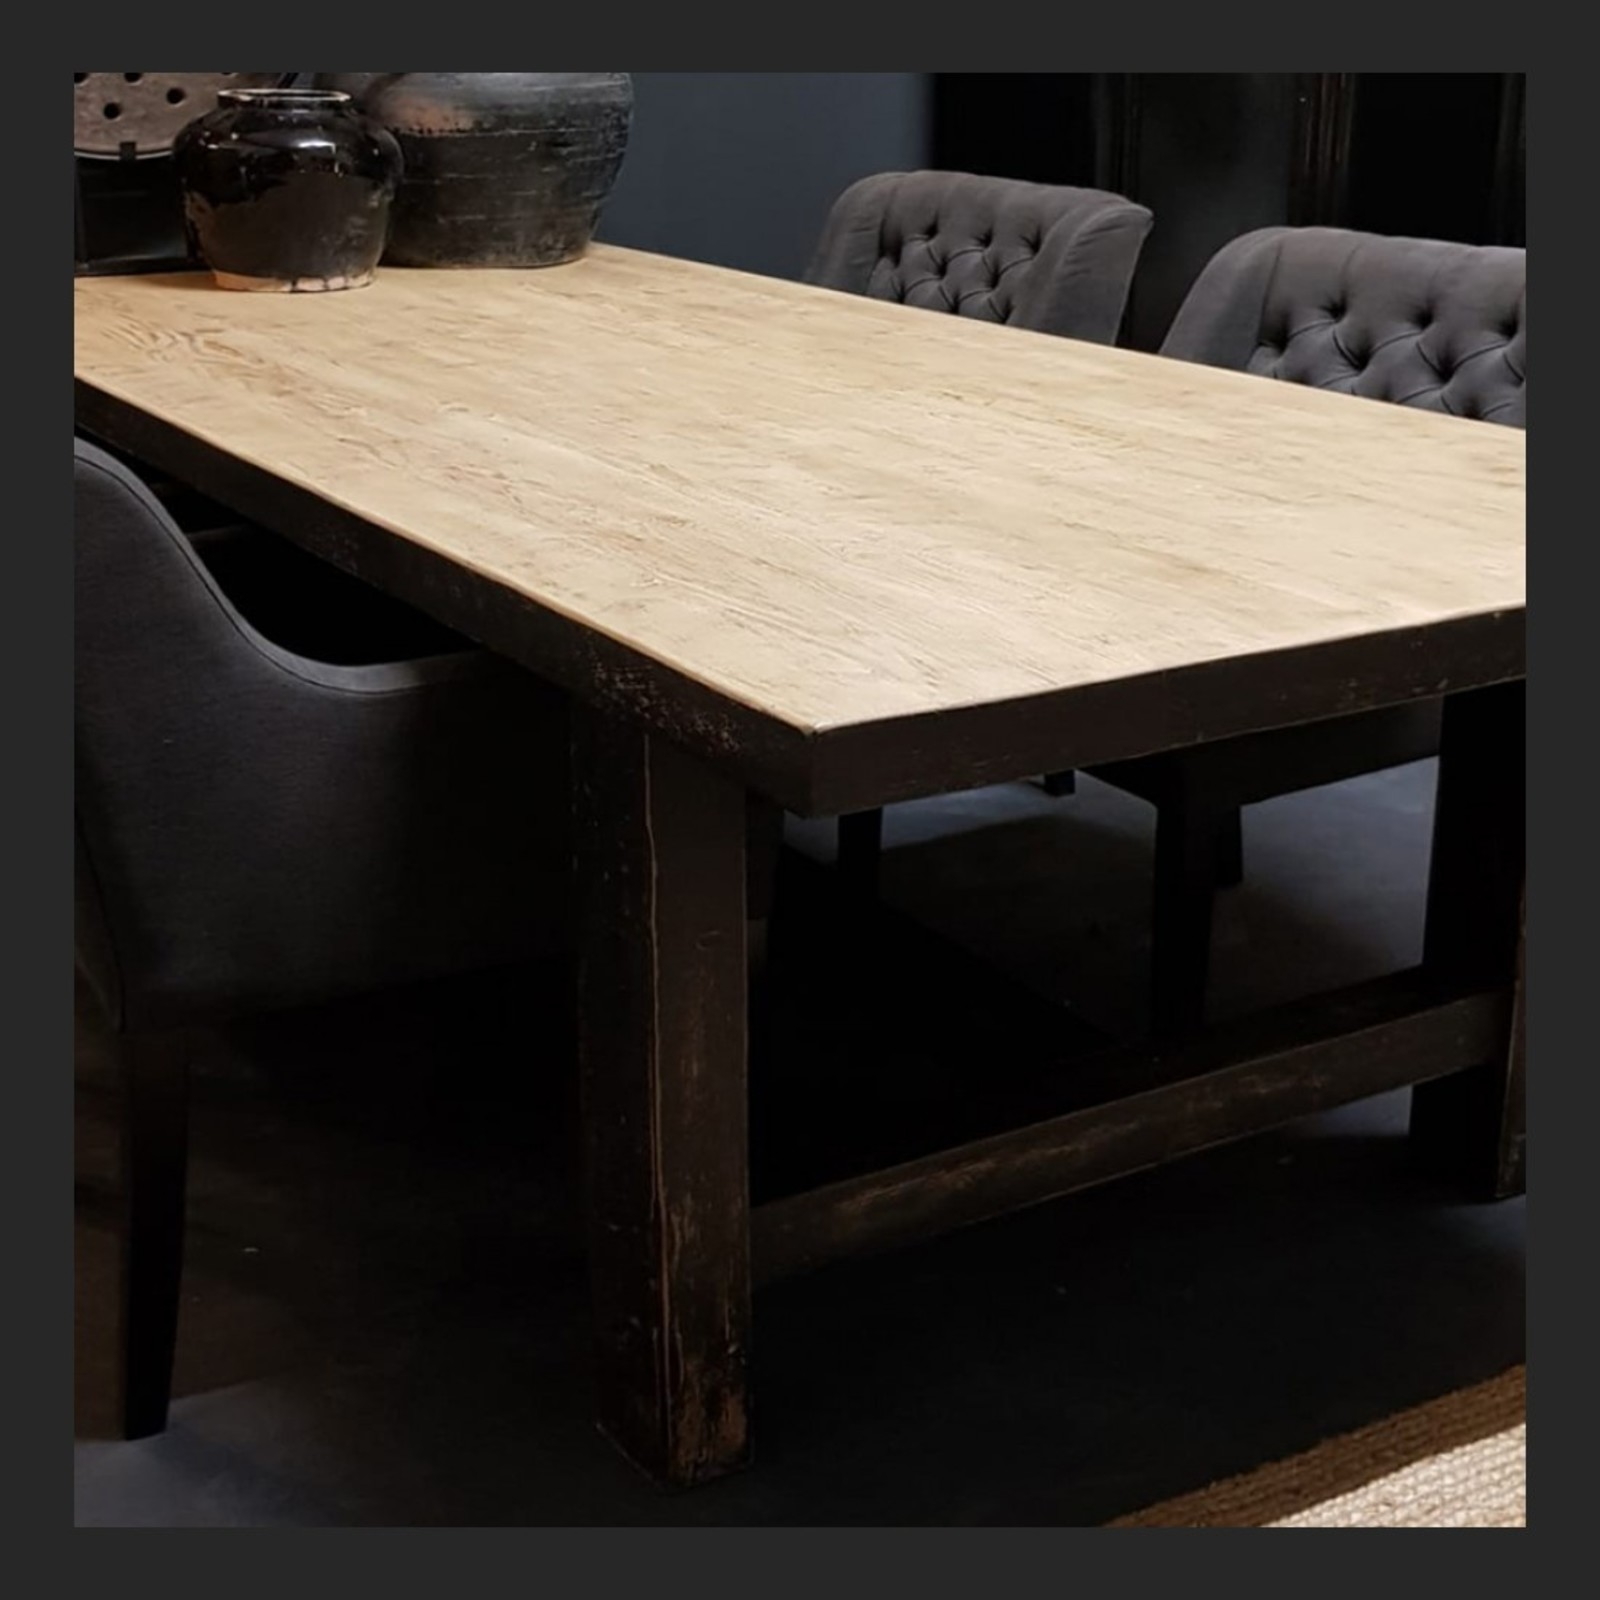 Luksa Oud houten eettafel 240x100 cm